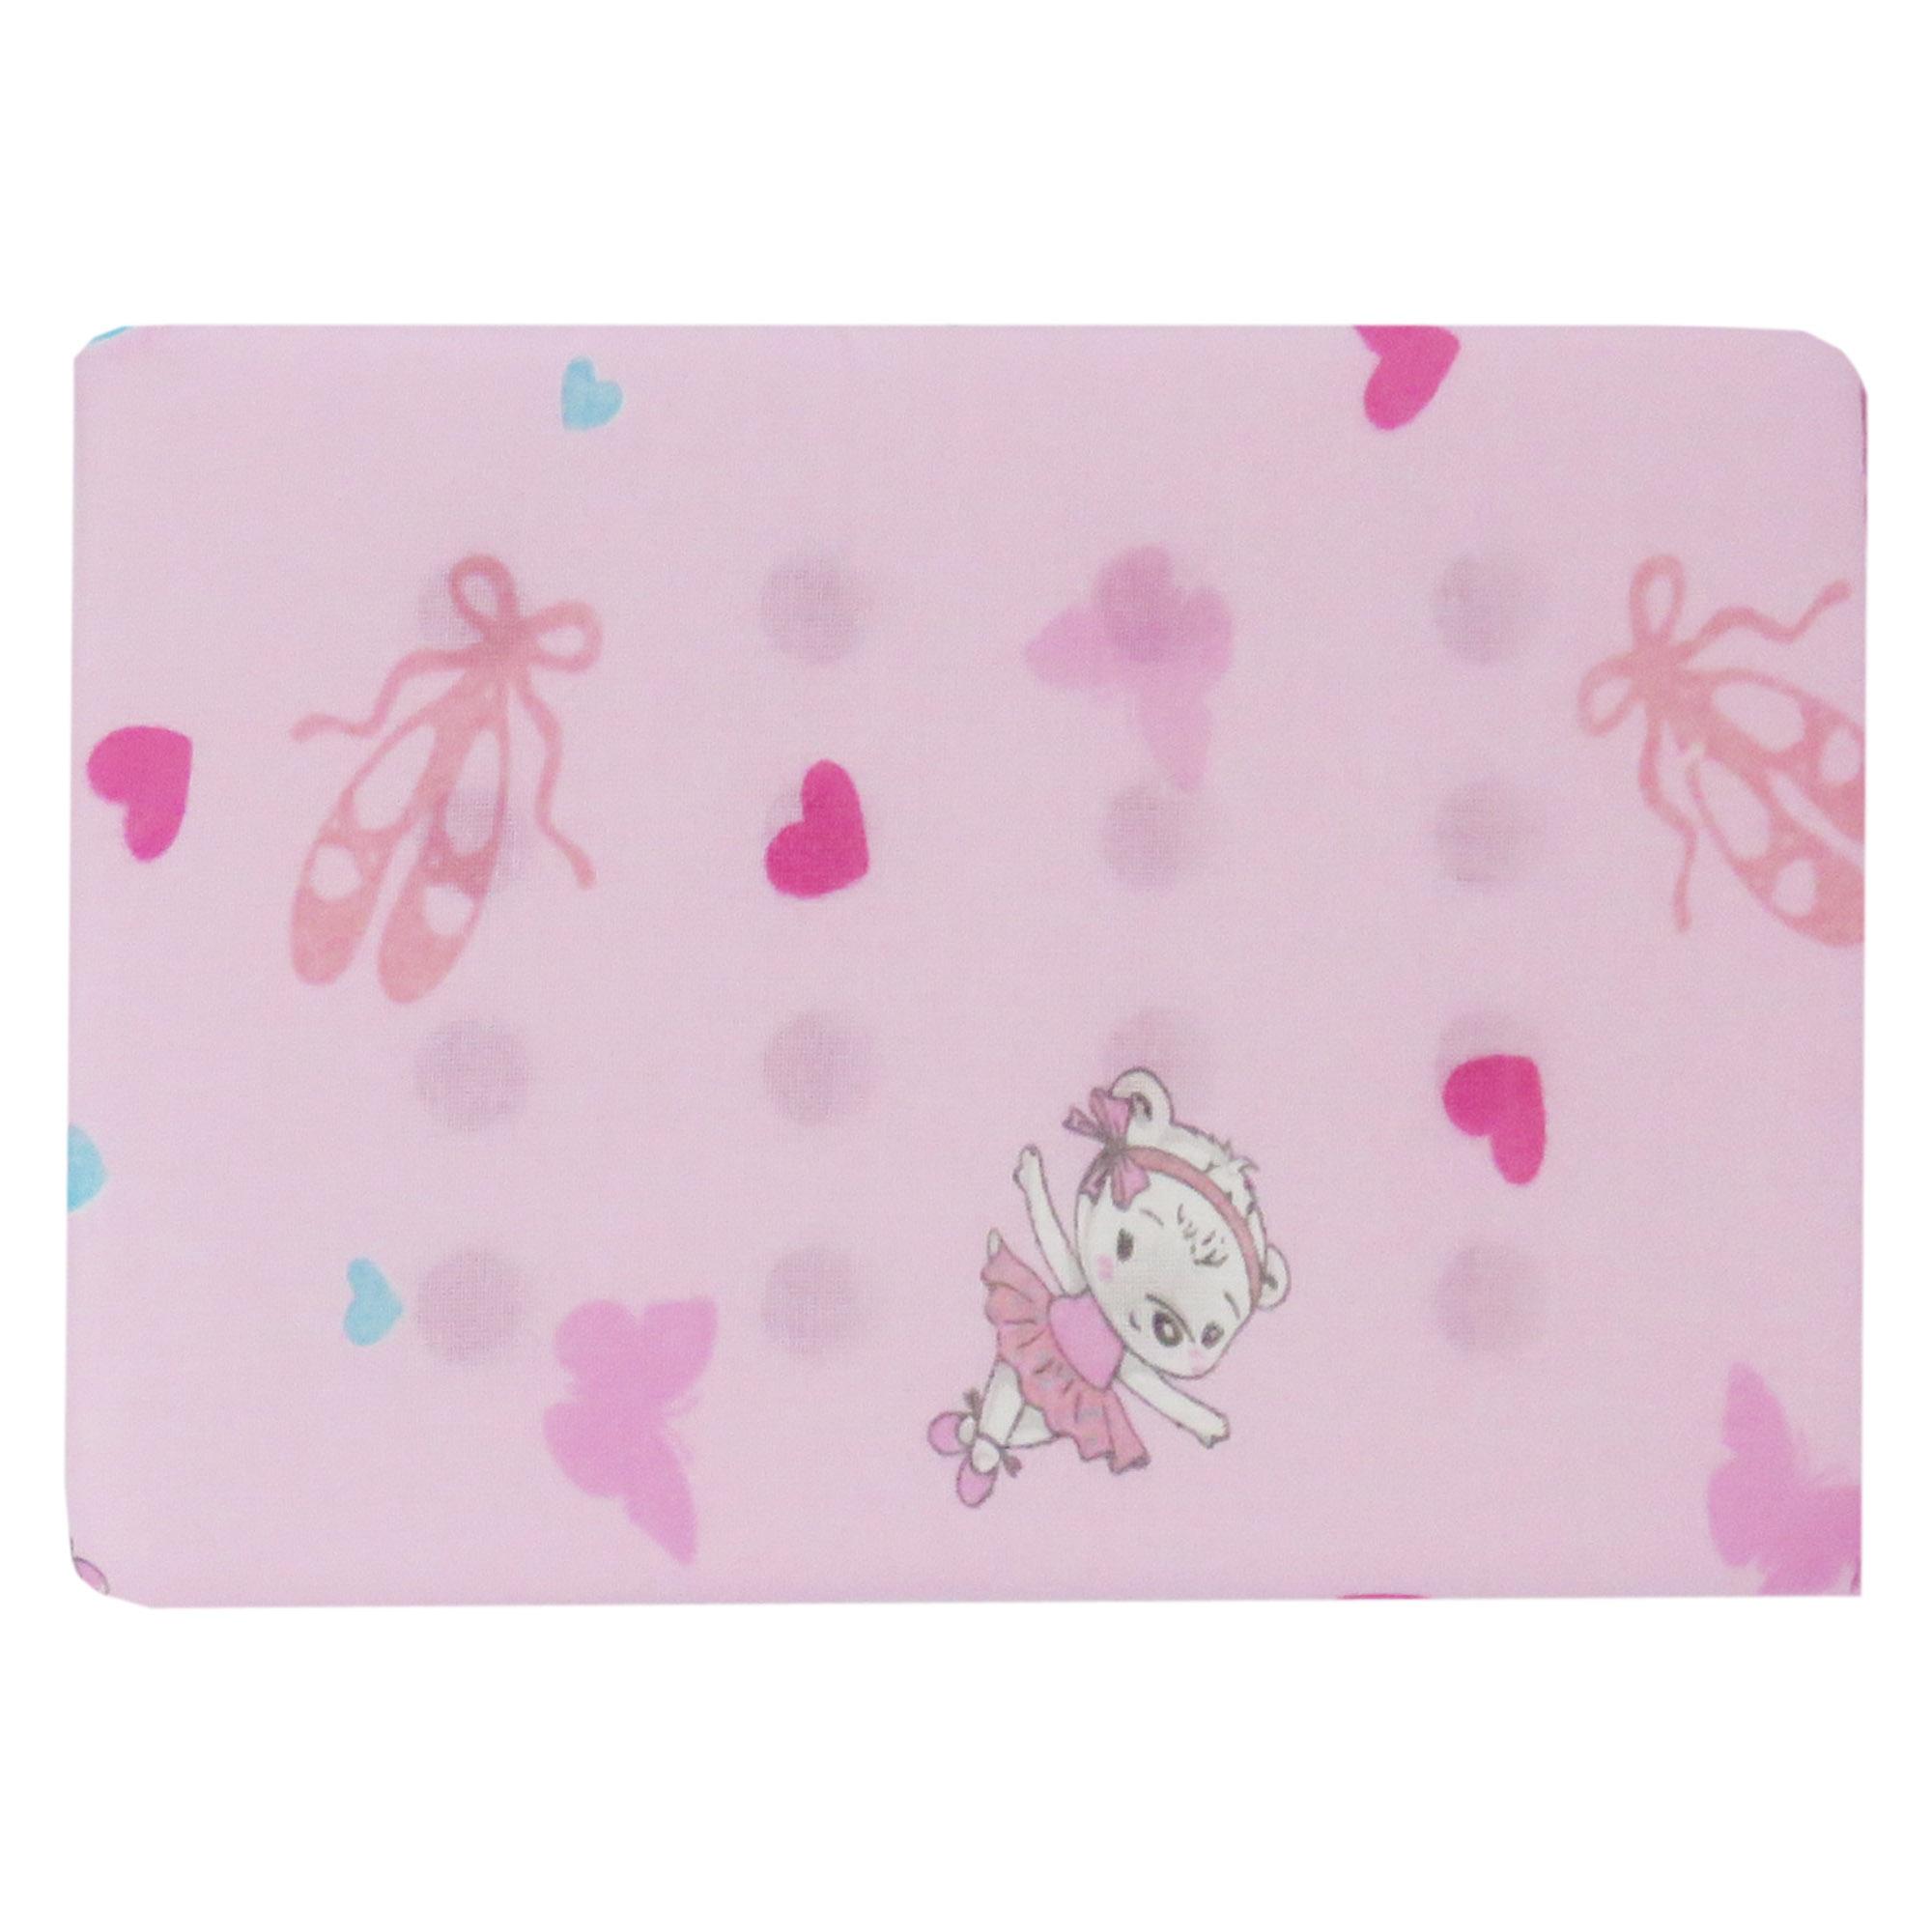 Travesseiro Antissufocante Estampado - Incomfral - Bambi - Menina Bailarina